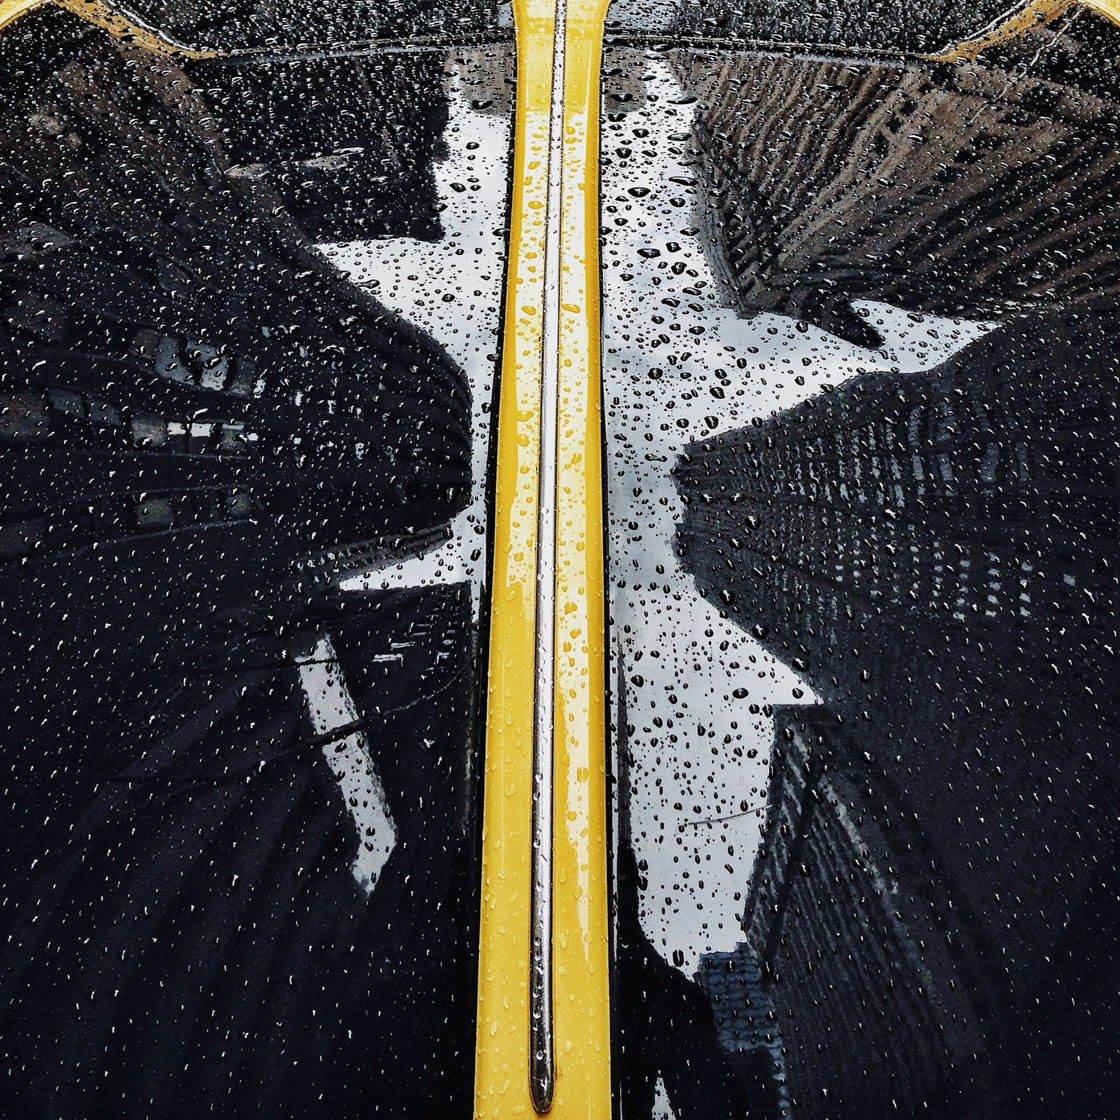 Urban Design iPhone Photos 39 no script